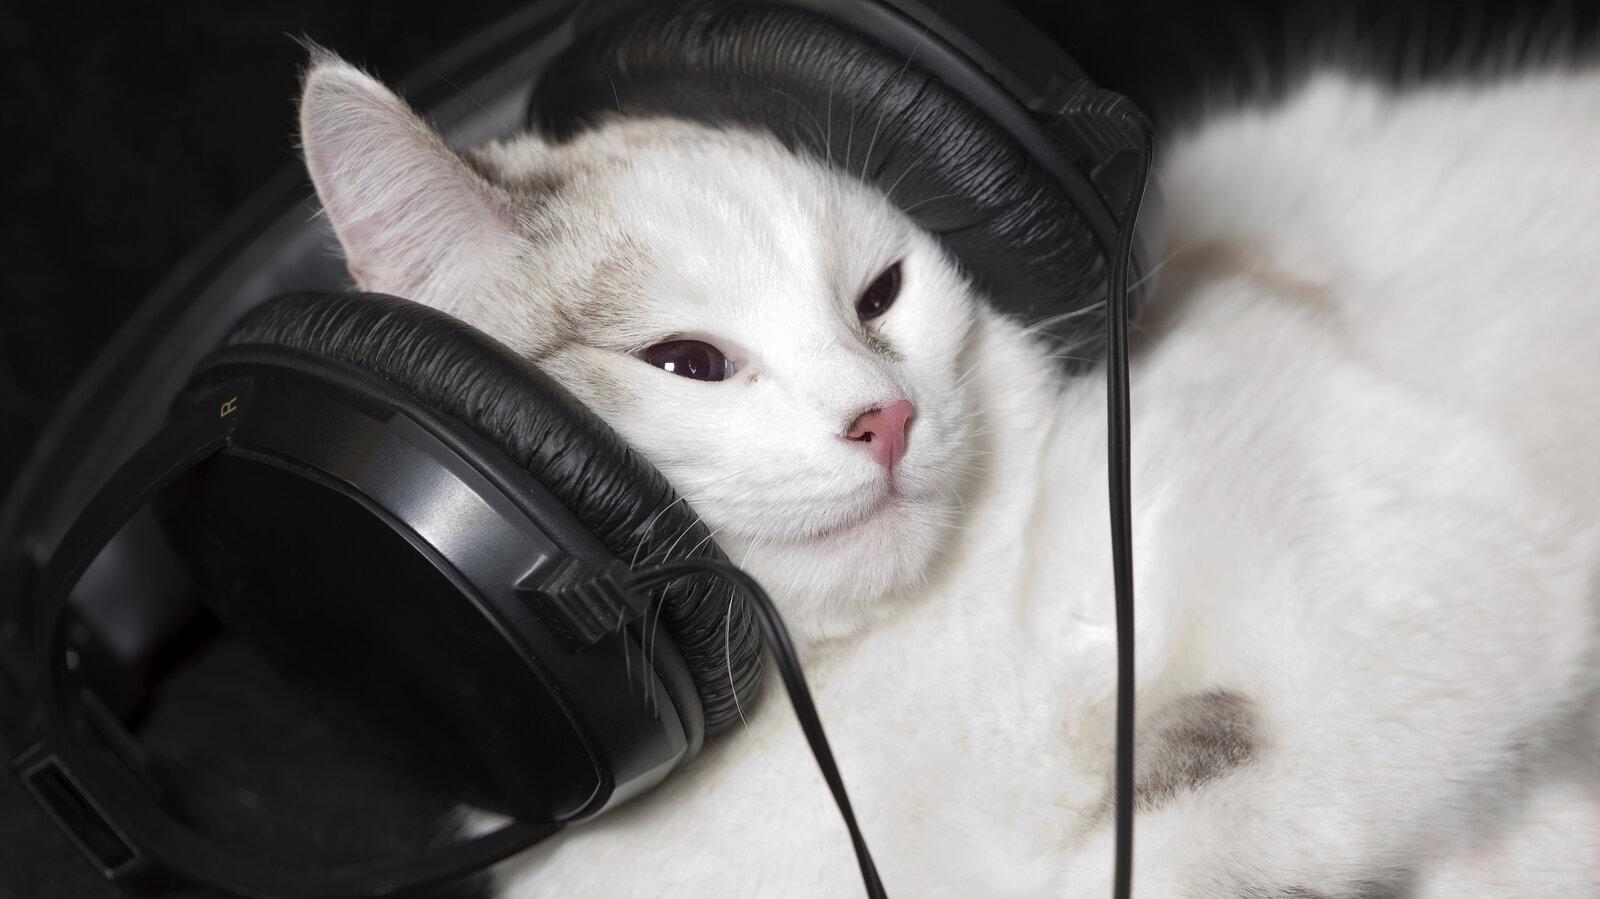 Music to Calm a Cat